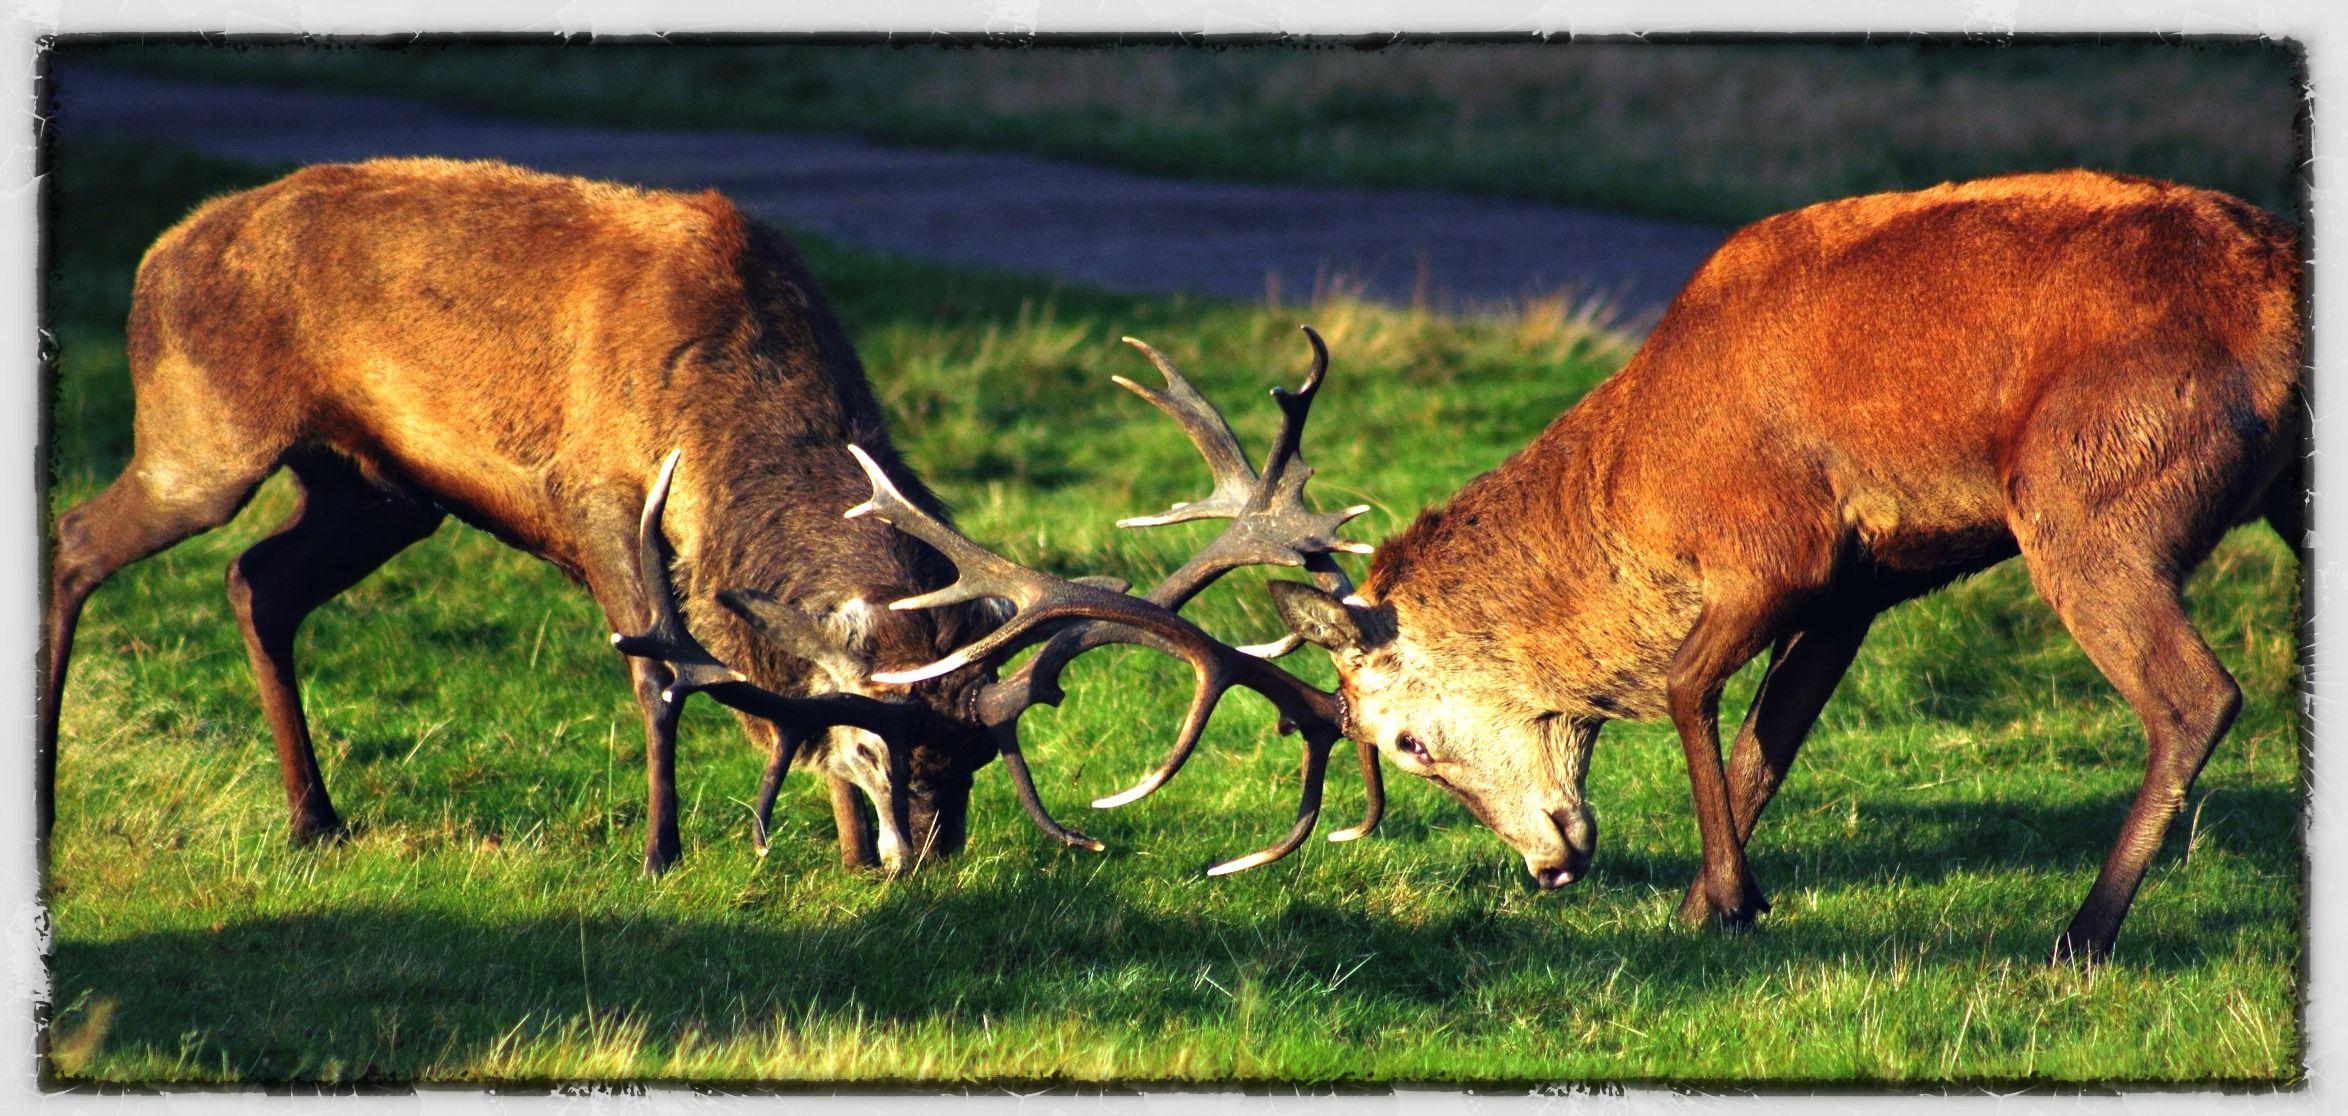 Deer Rut In Richmond Park London | Deer Rut, London Park